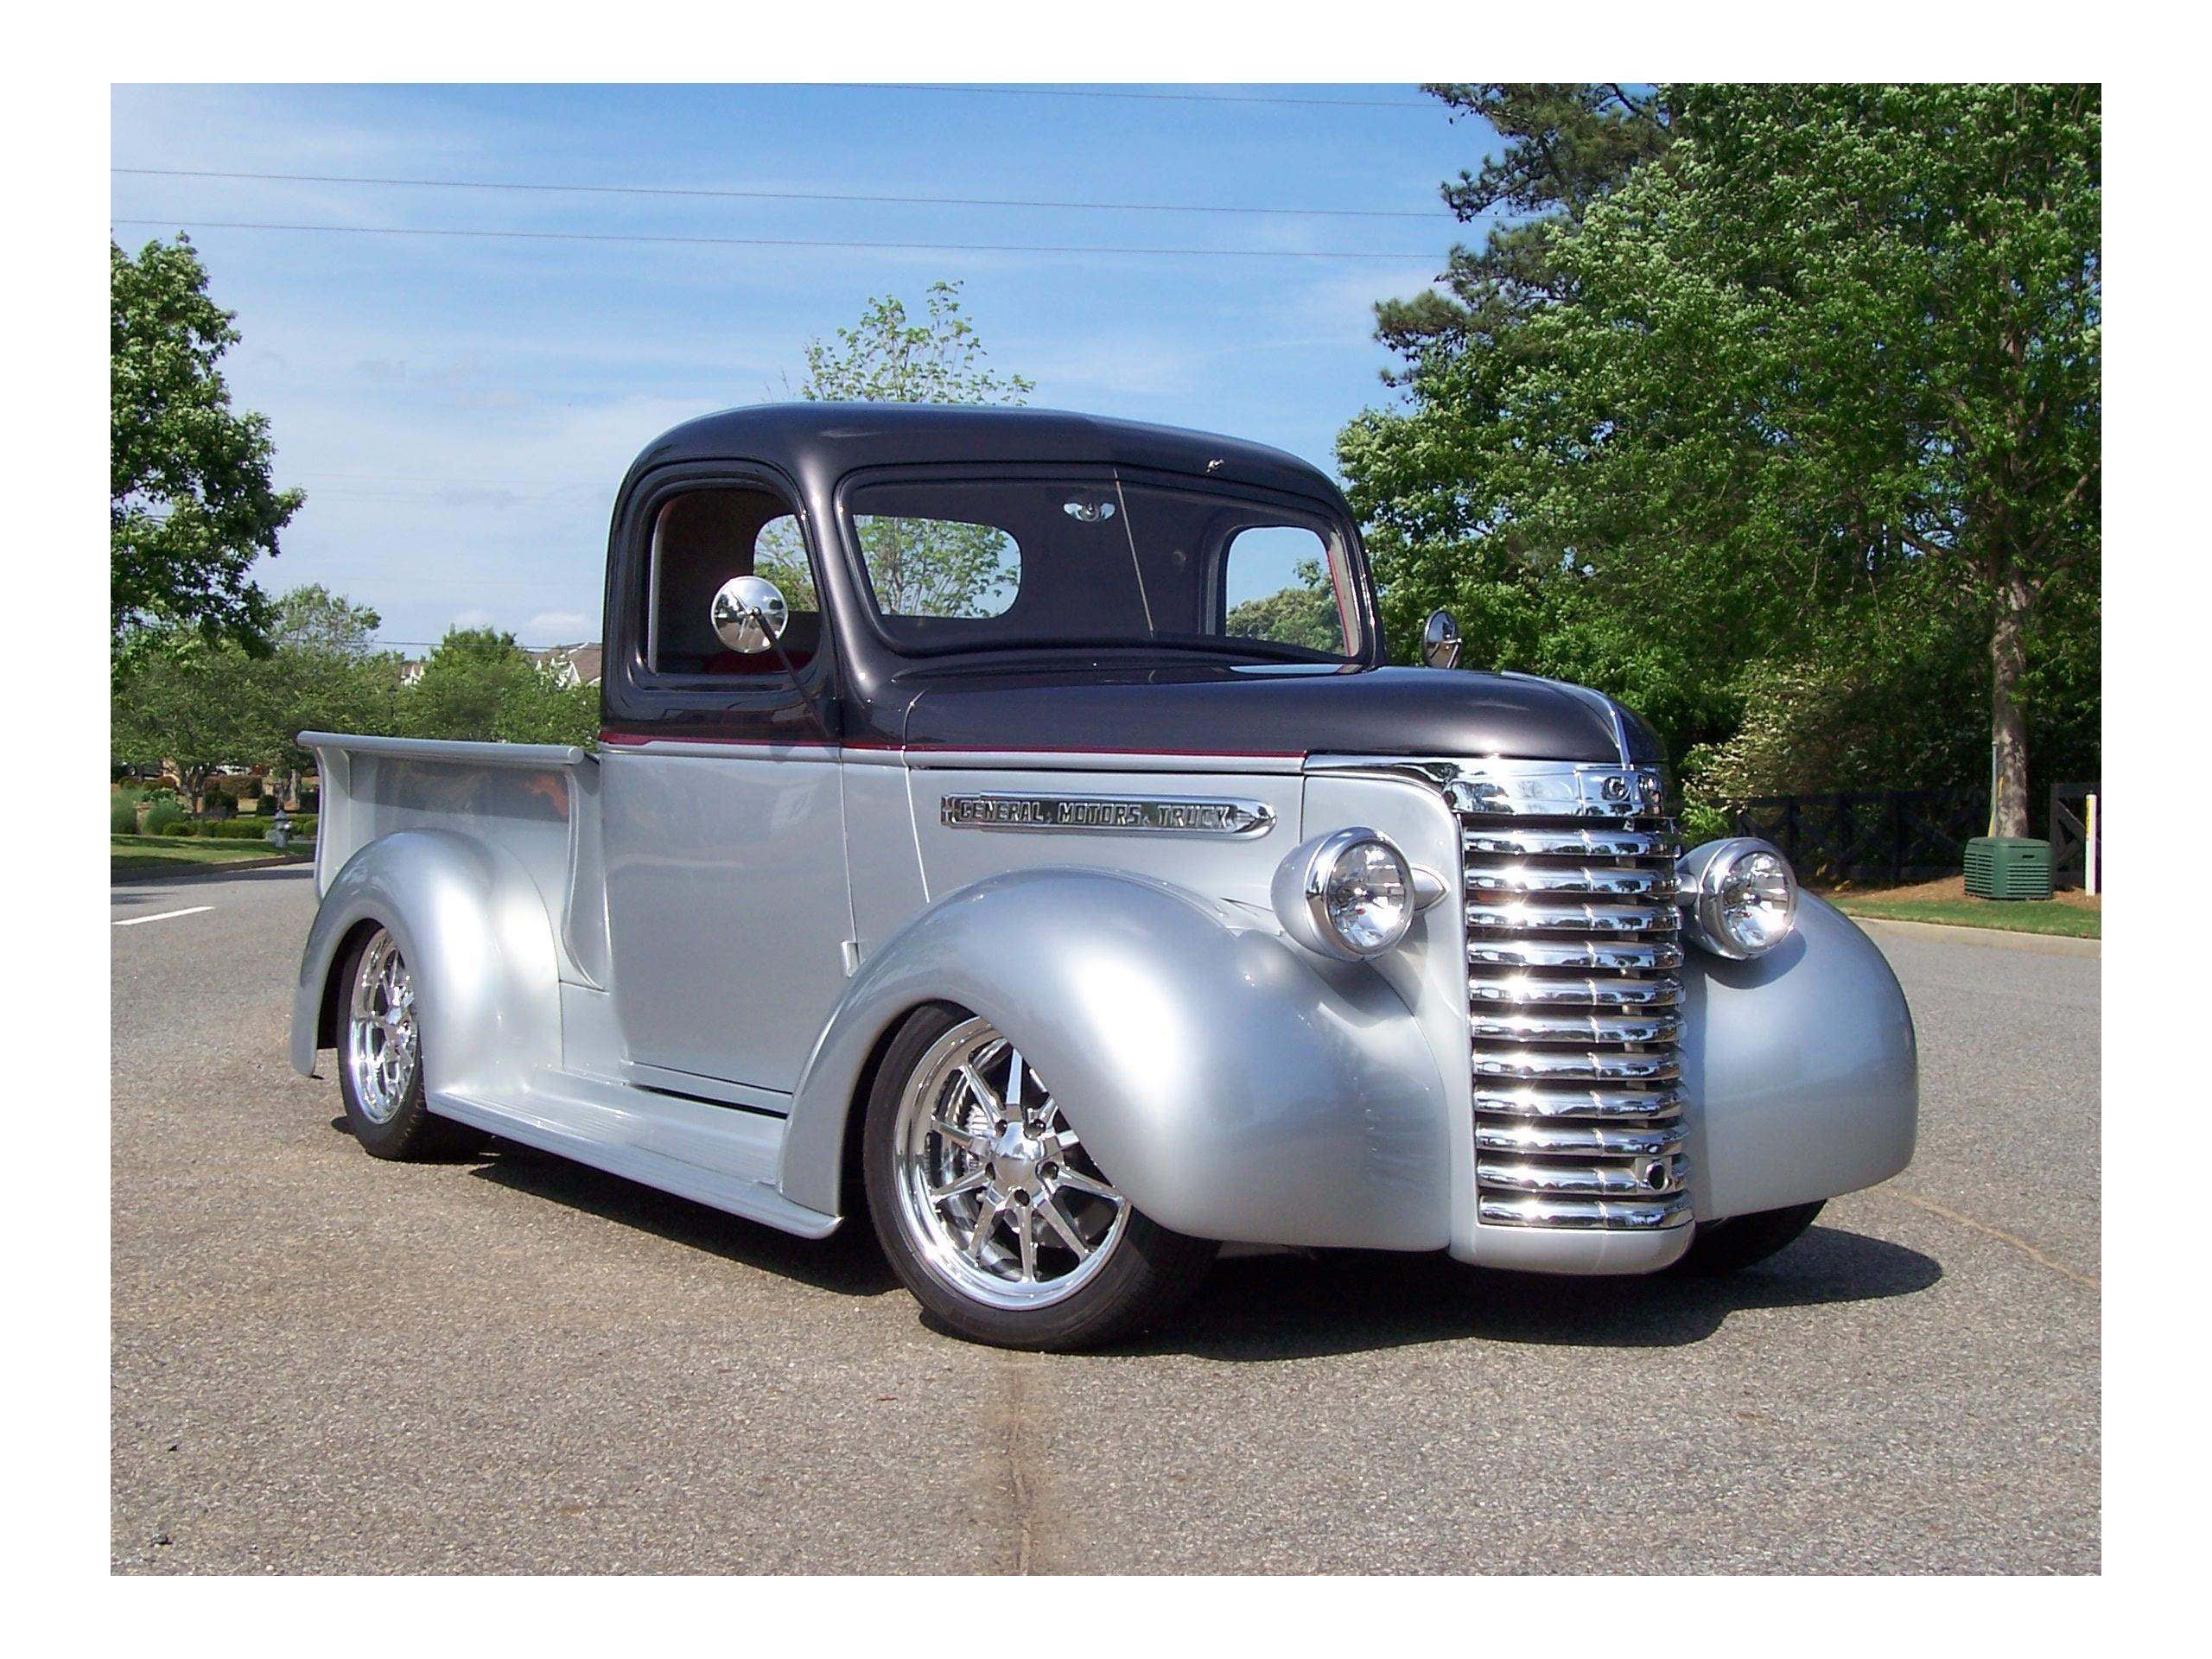 1939 Gmc Pickup For Sale Listing Id Cc 1127699 Classiccars Com Driveyourdream Gmc Gmc Pickup Classic Gmc Gmc